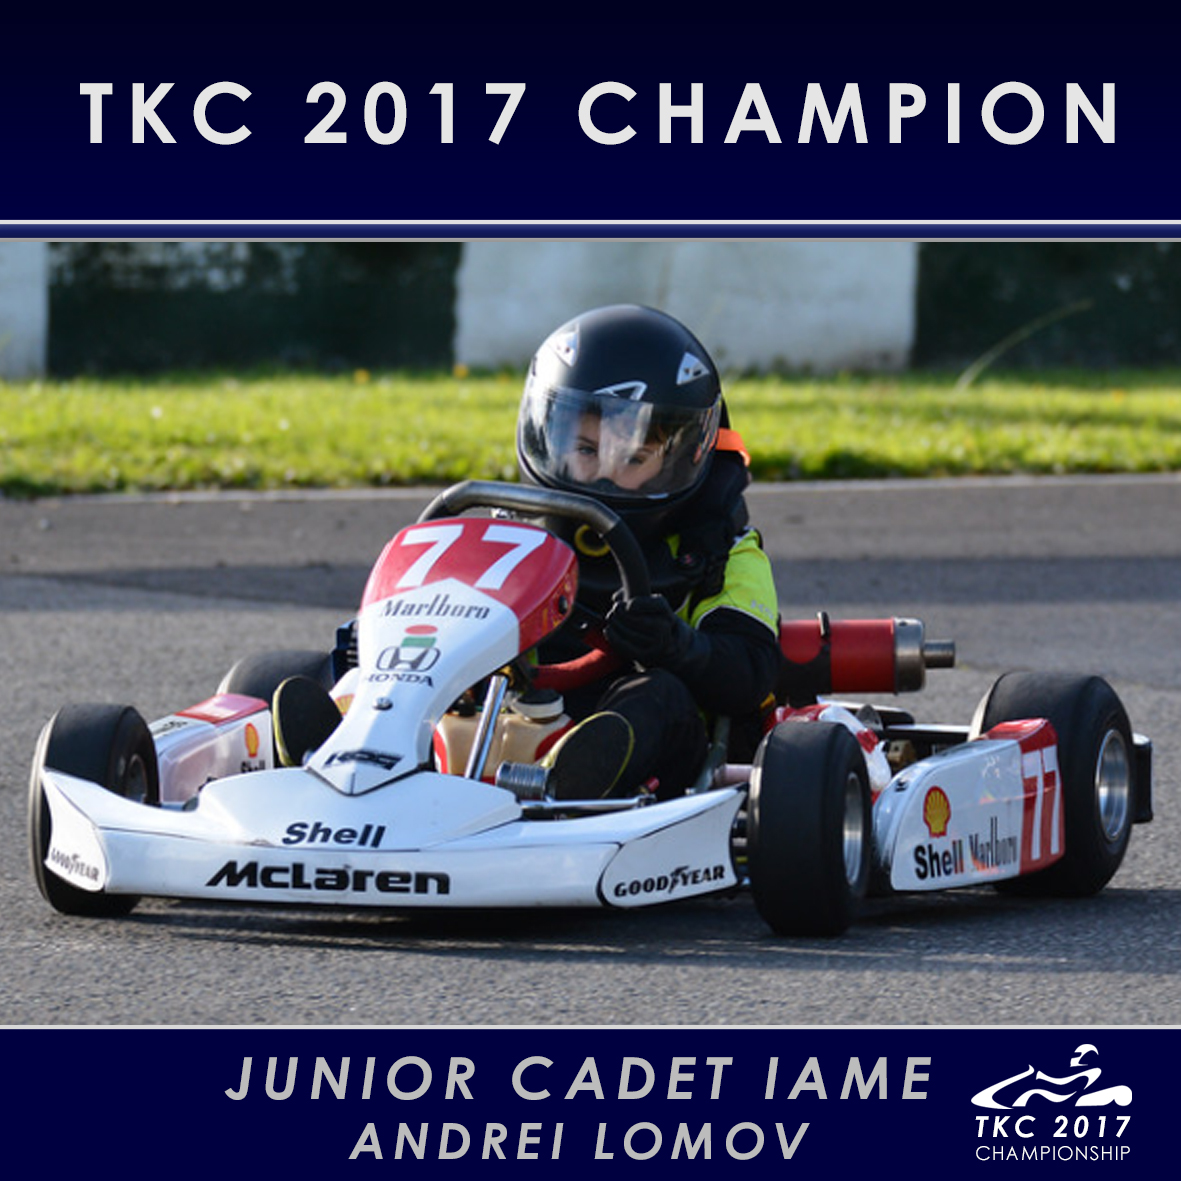 Jr Cadet Iame - Andrei Lomov